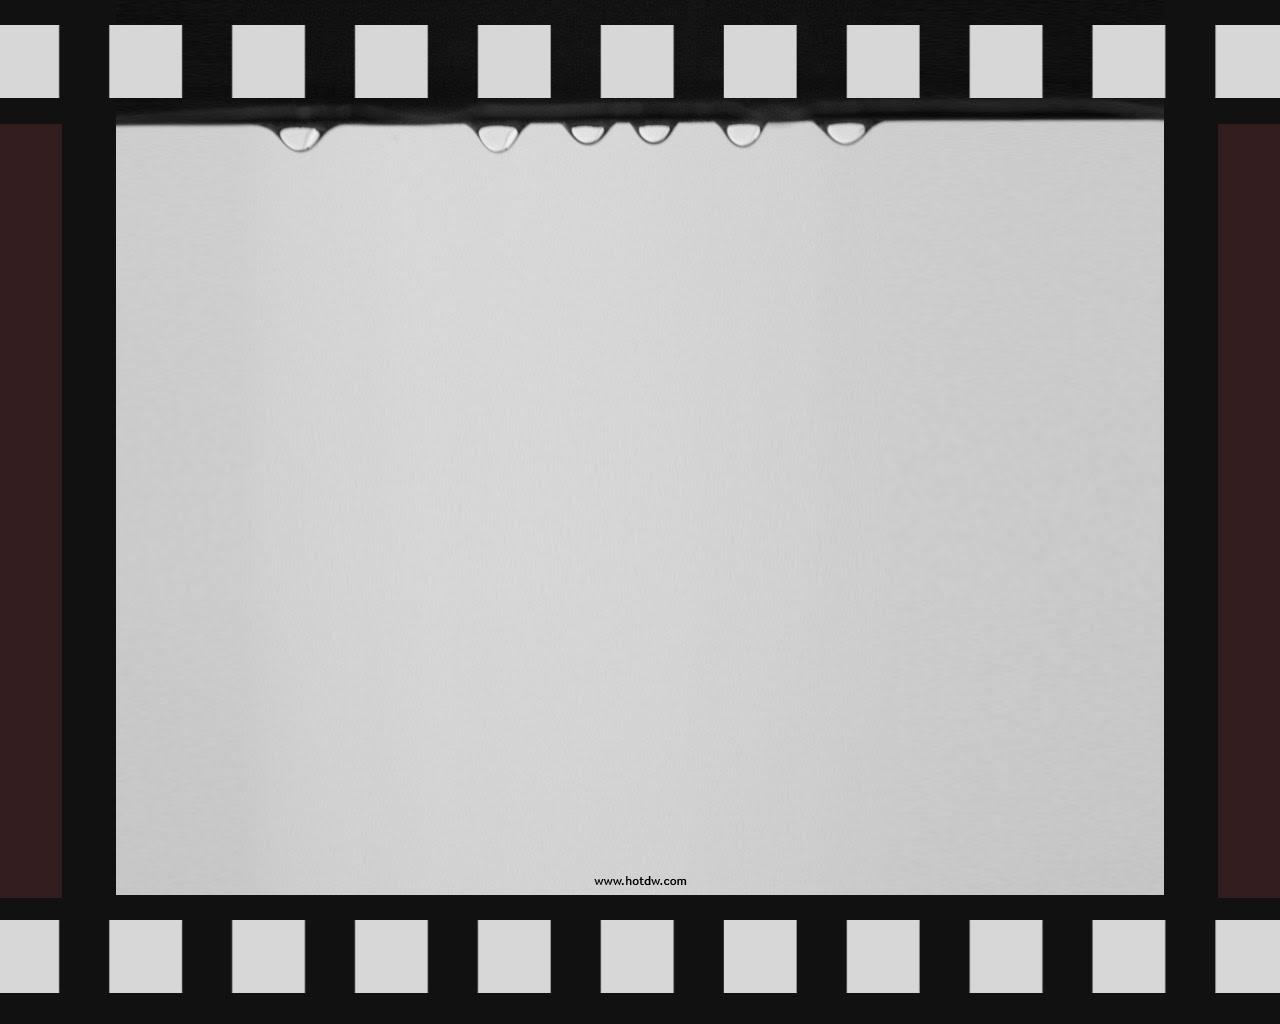 Download 9800 Koleksi Background Power Point Pembukaan Bergerak Gratis Terbaru